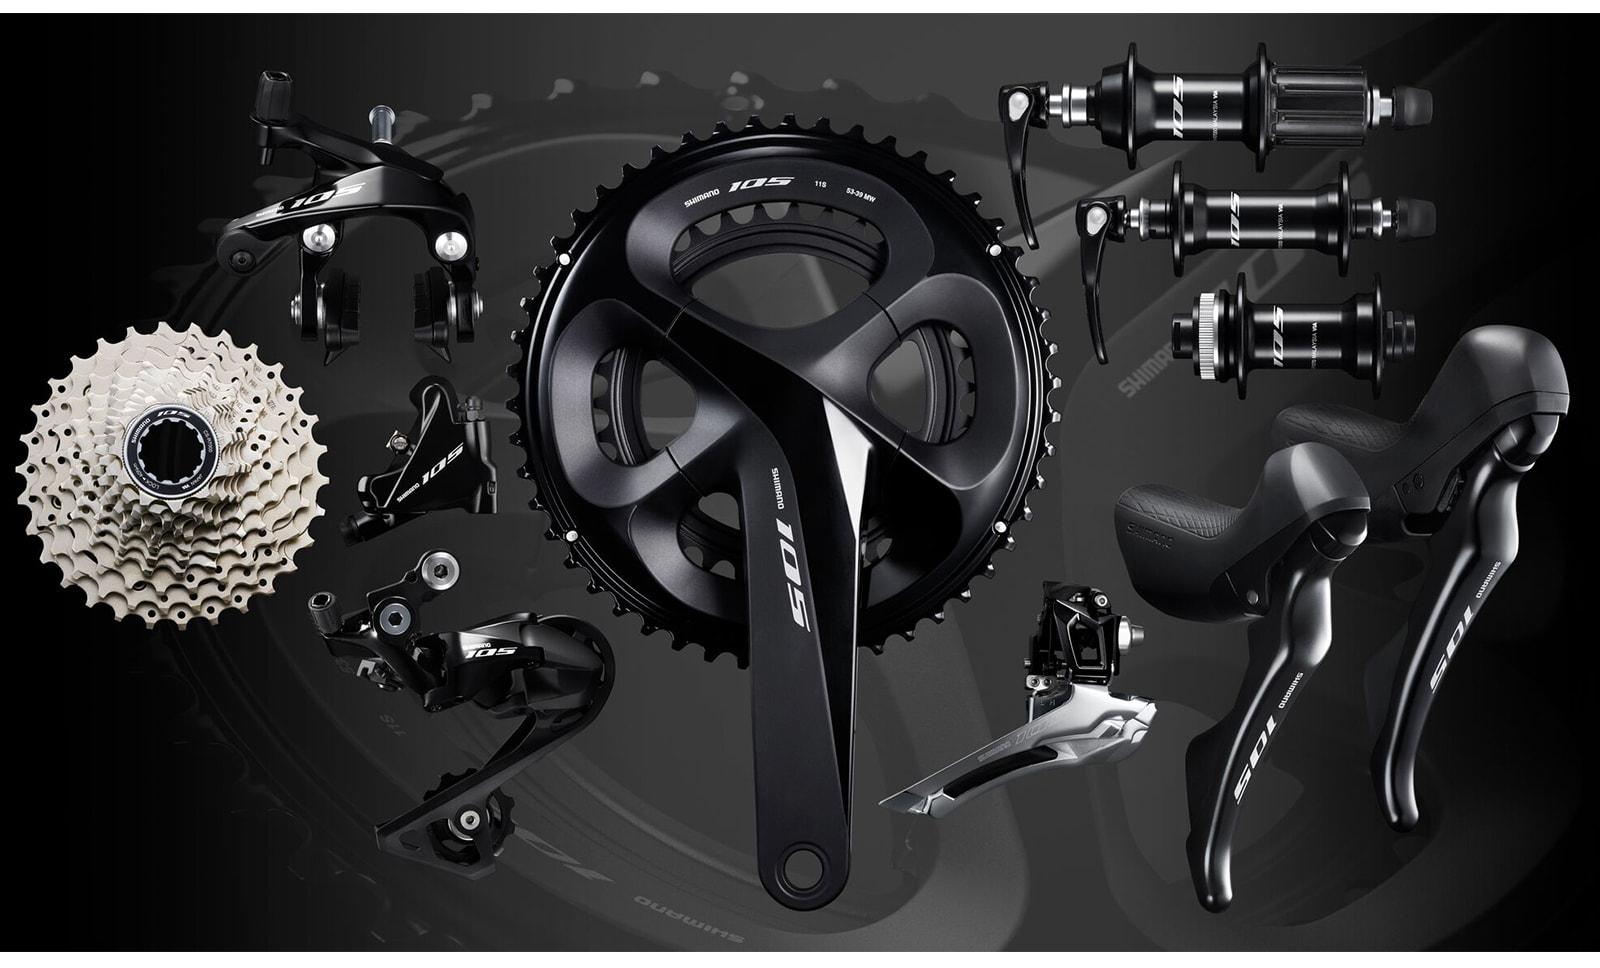 Shimano-105-R7000-groupset-black.jpg